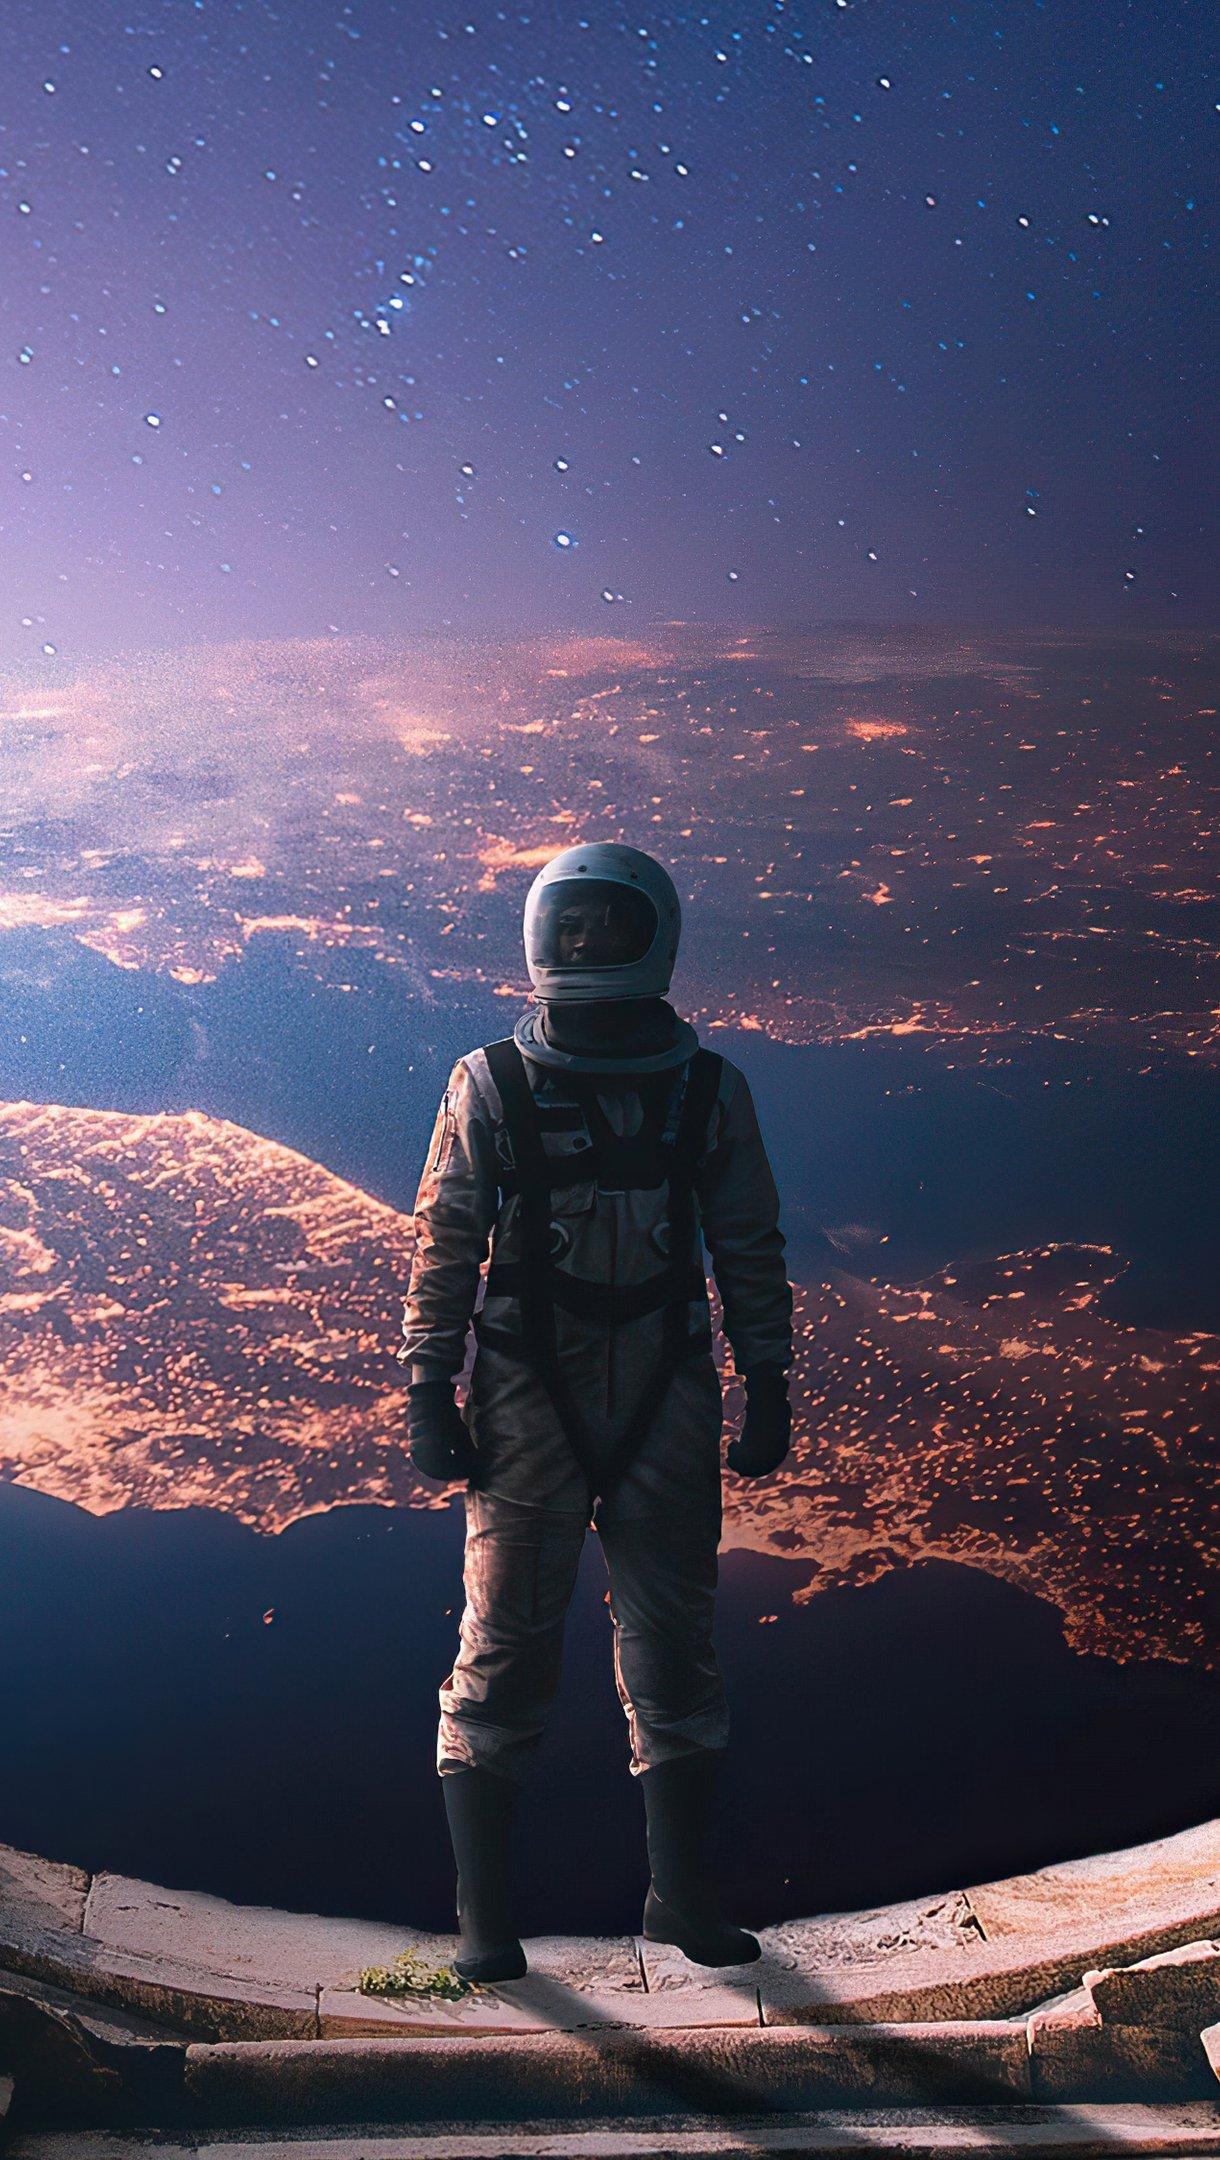 Wallpaper Interstellar Astronaut Vertical